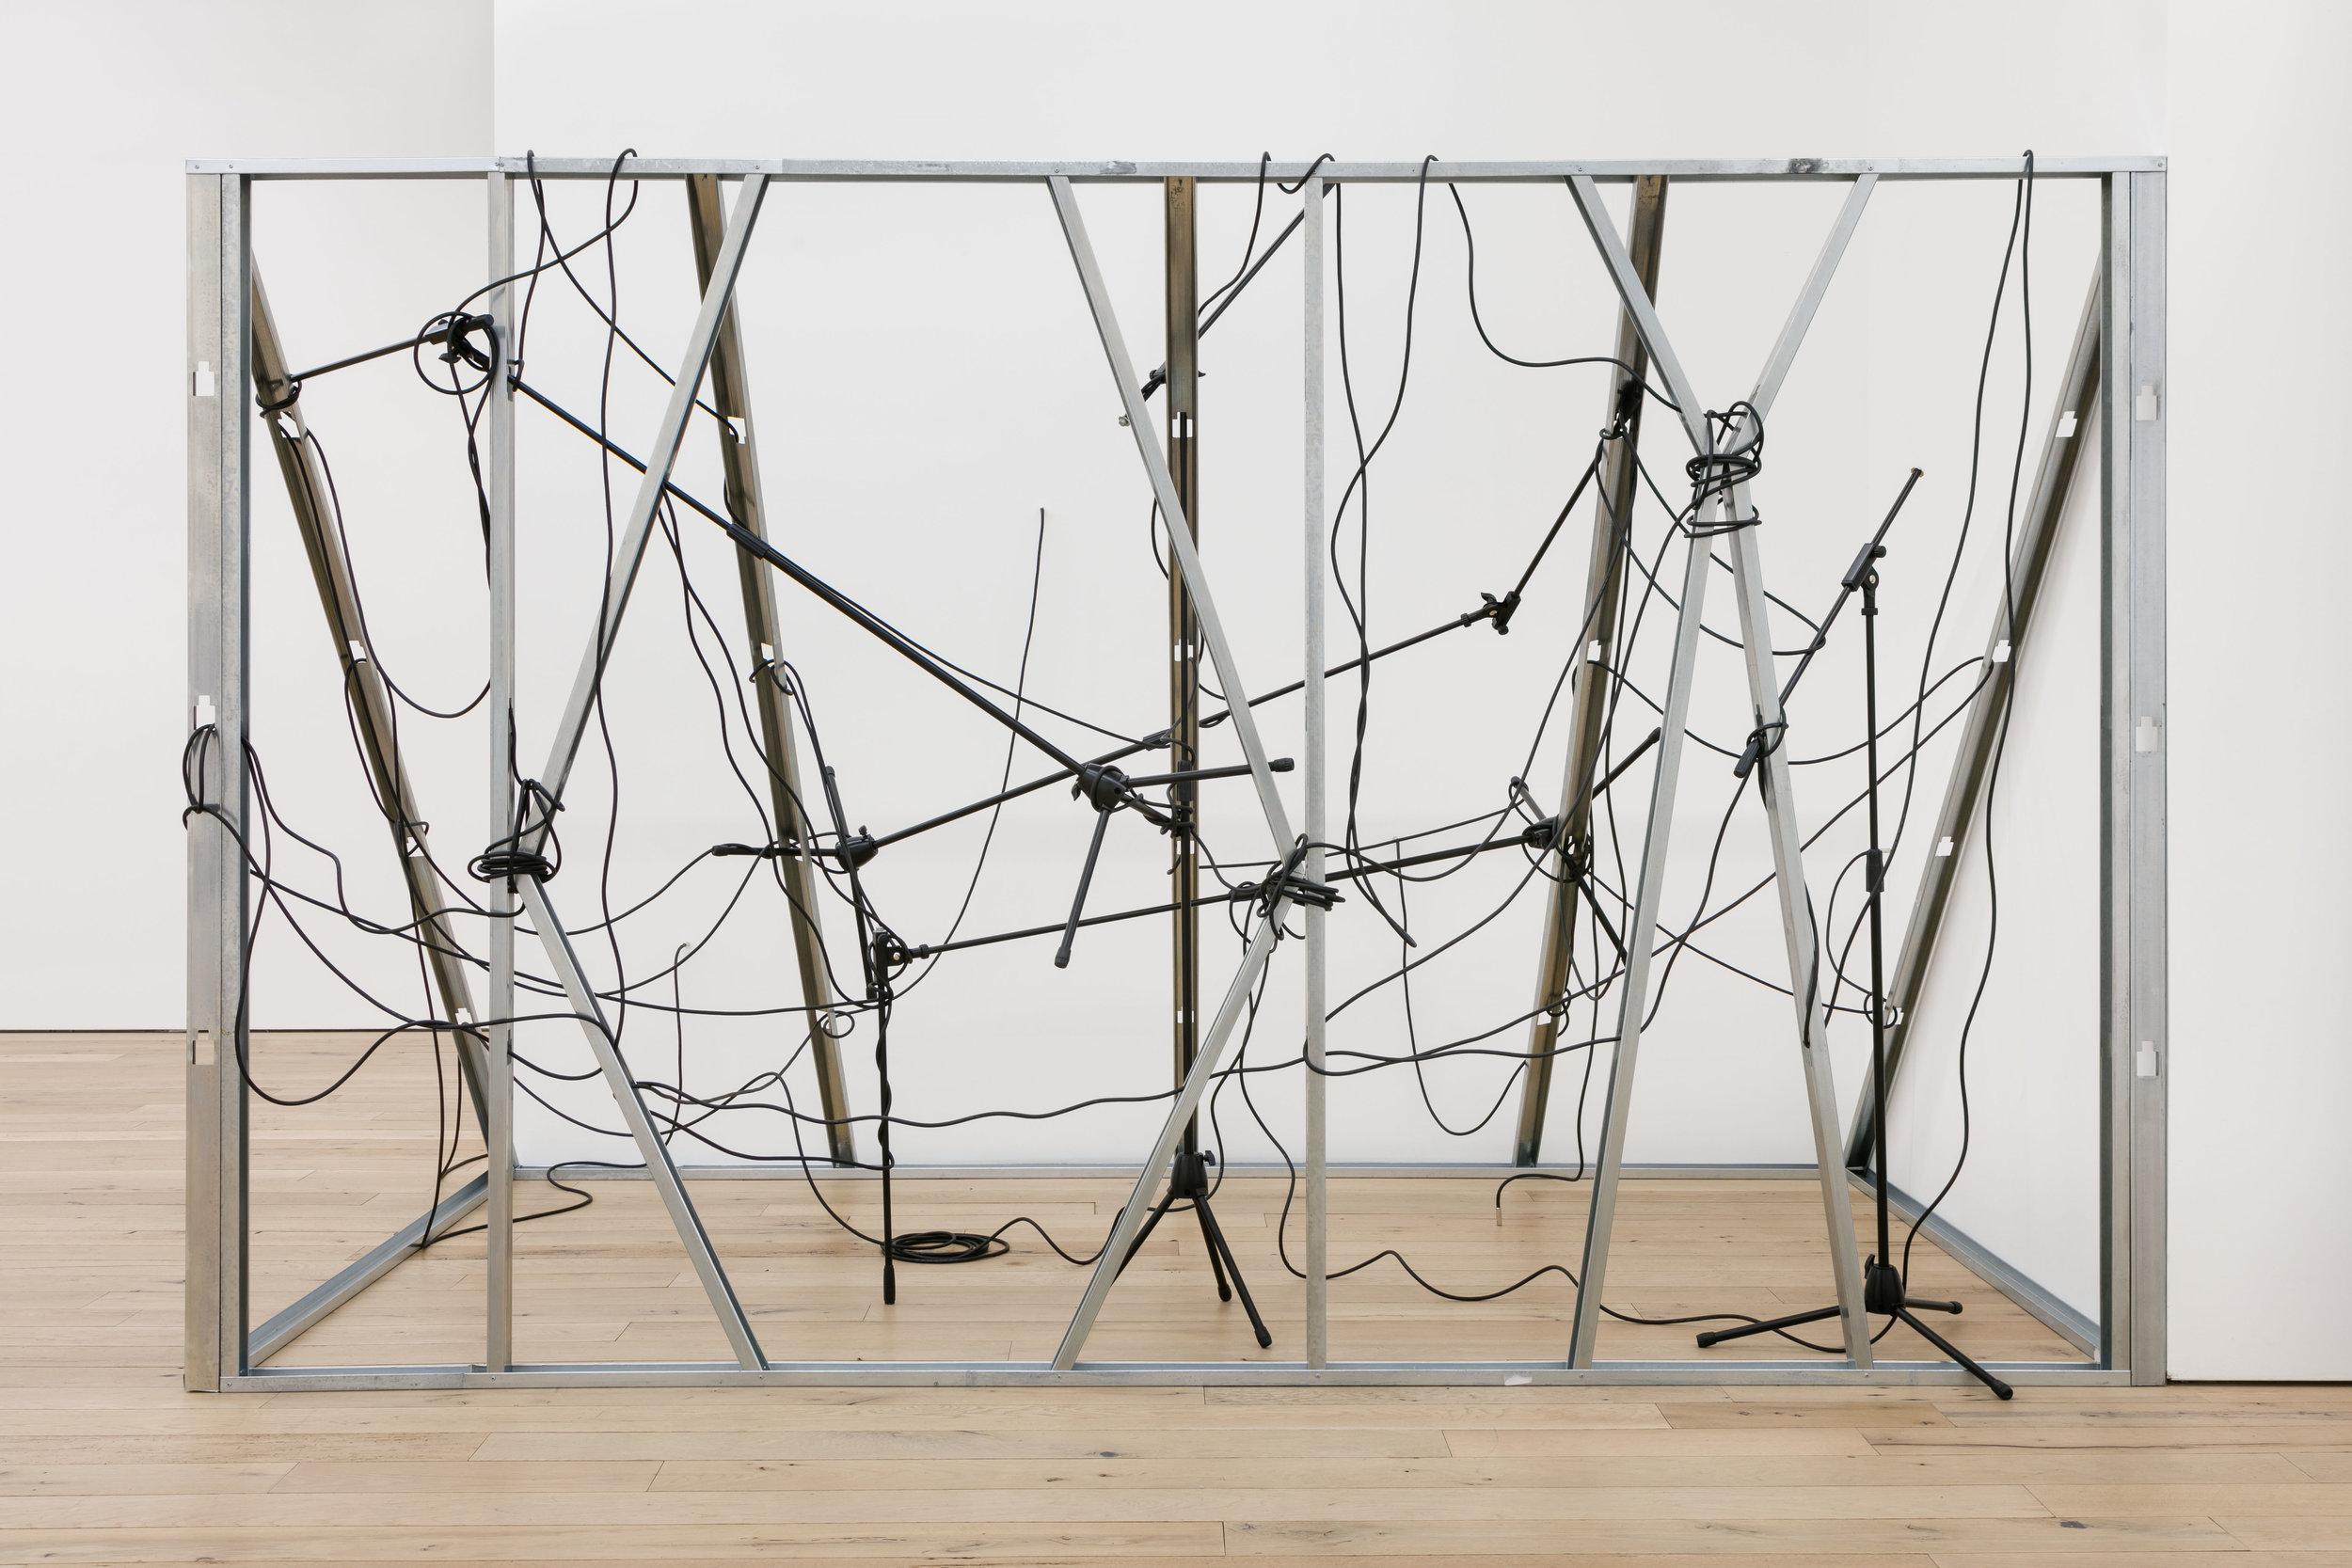 Nikita Gale,  INTERCEPTOR , 2019, mic stands, cables, metal studs, 85 x 138 x 89 in.